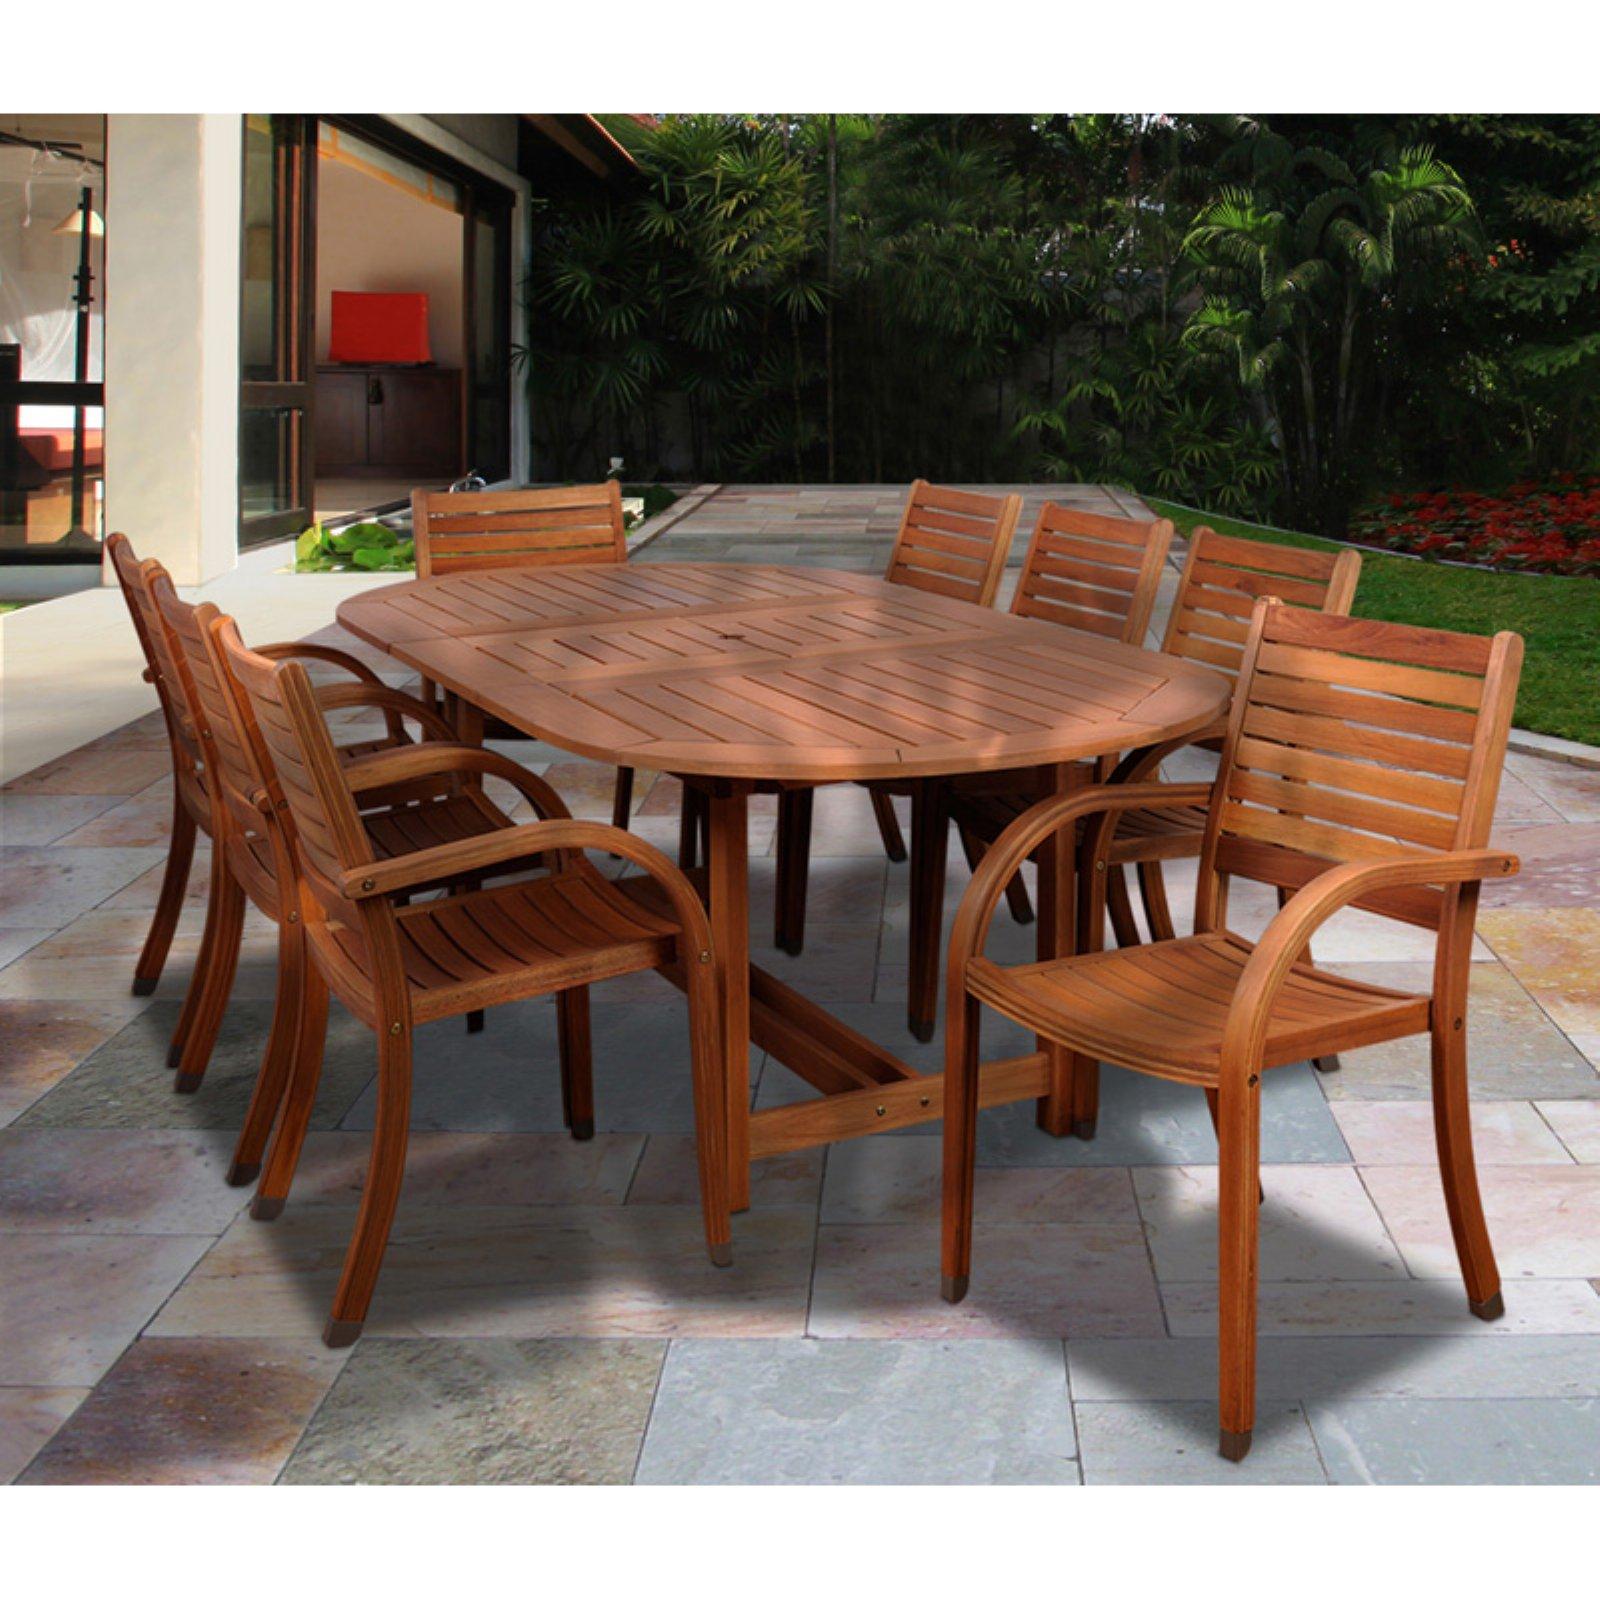 Ia Kentucky 9 Piece Oval Eucalyptus Patio Dining Set